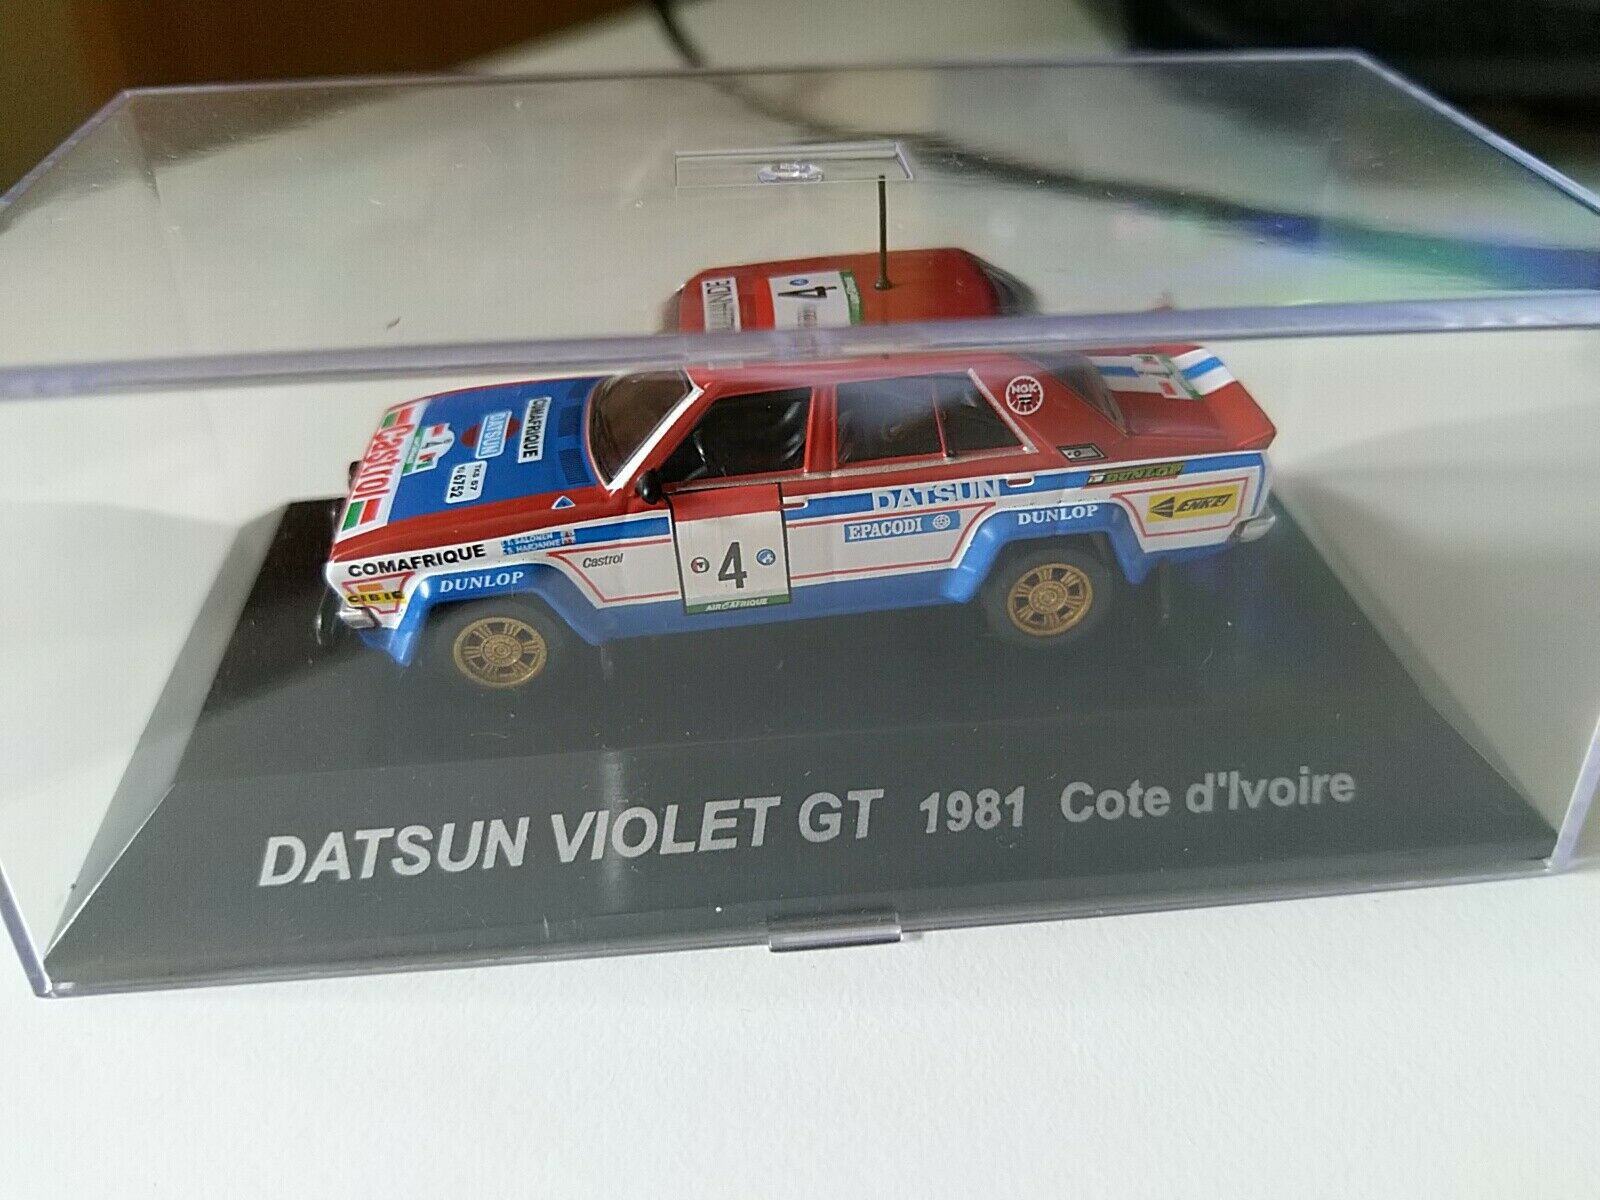 DATSUN lila GT 1981 COTE D' IVORE  RALLY 1 64 cm's